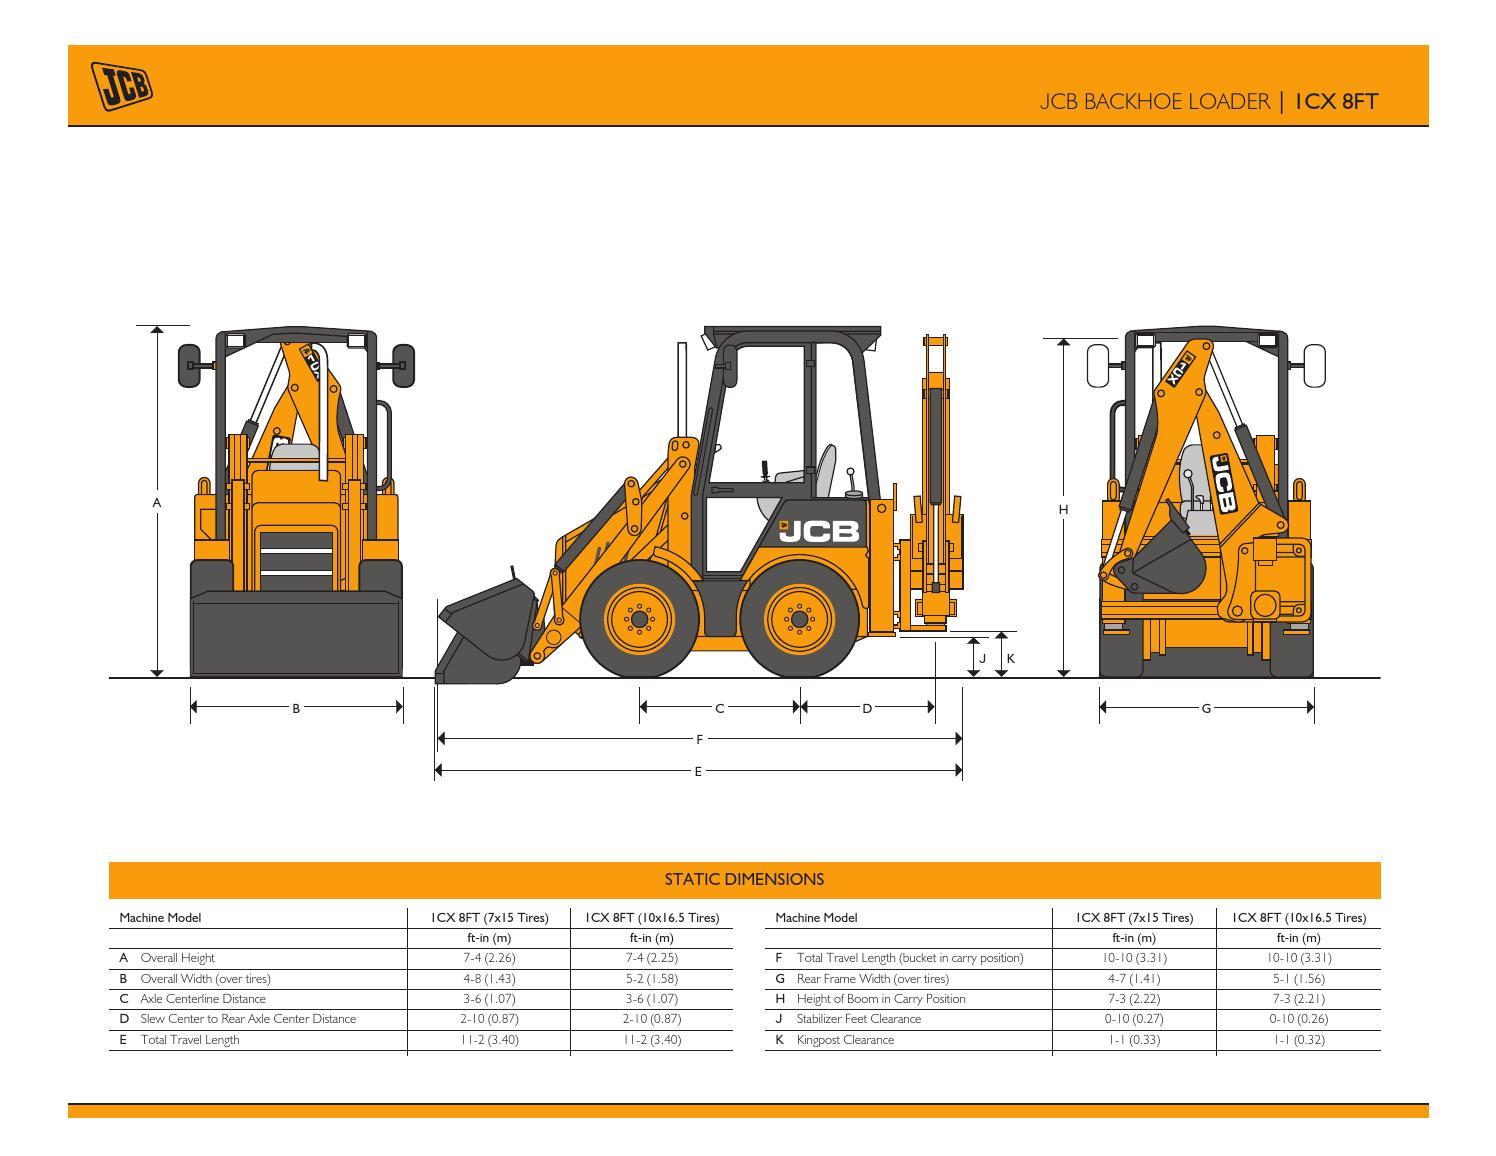 JCB - BHL 1CX Spec Sheet (US) Dec 2011 by JCB North America